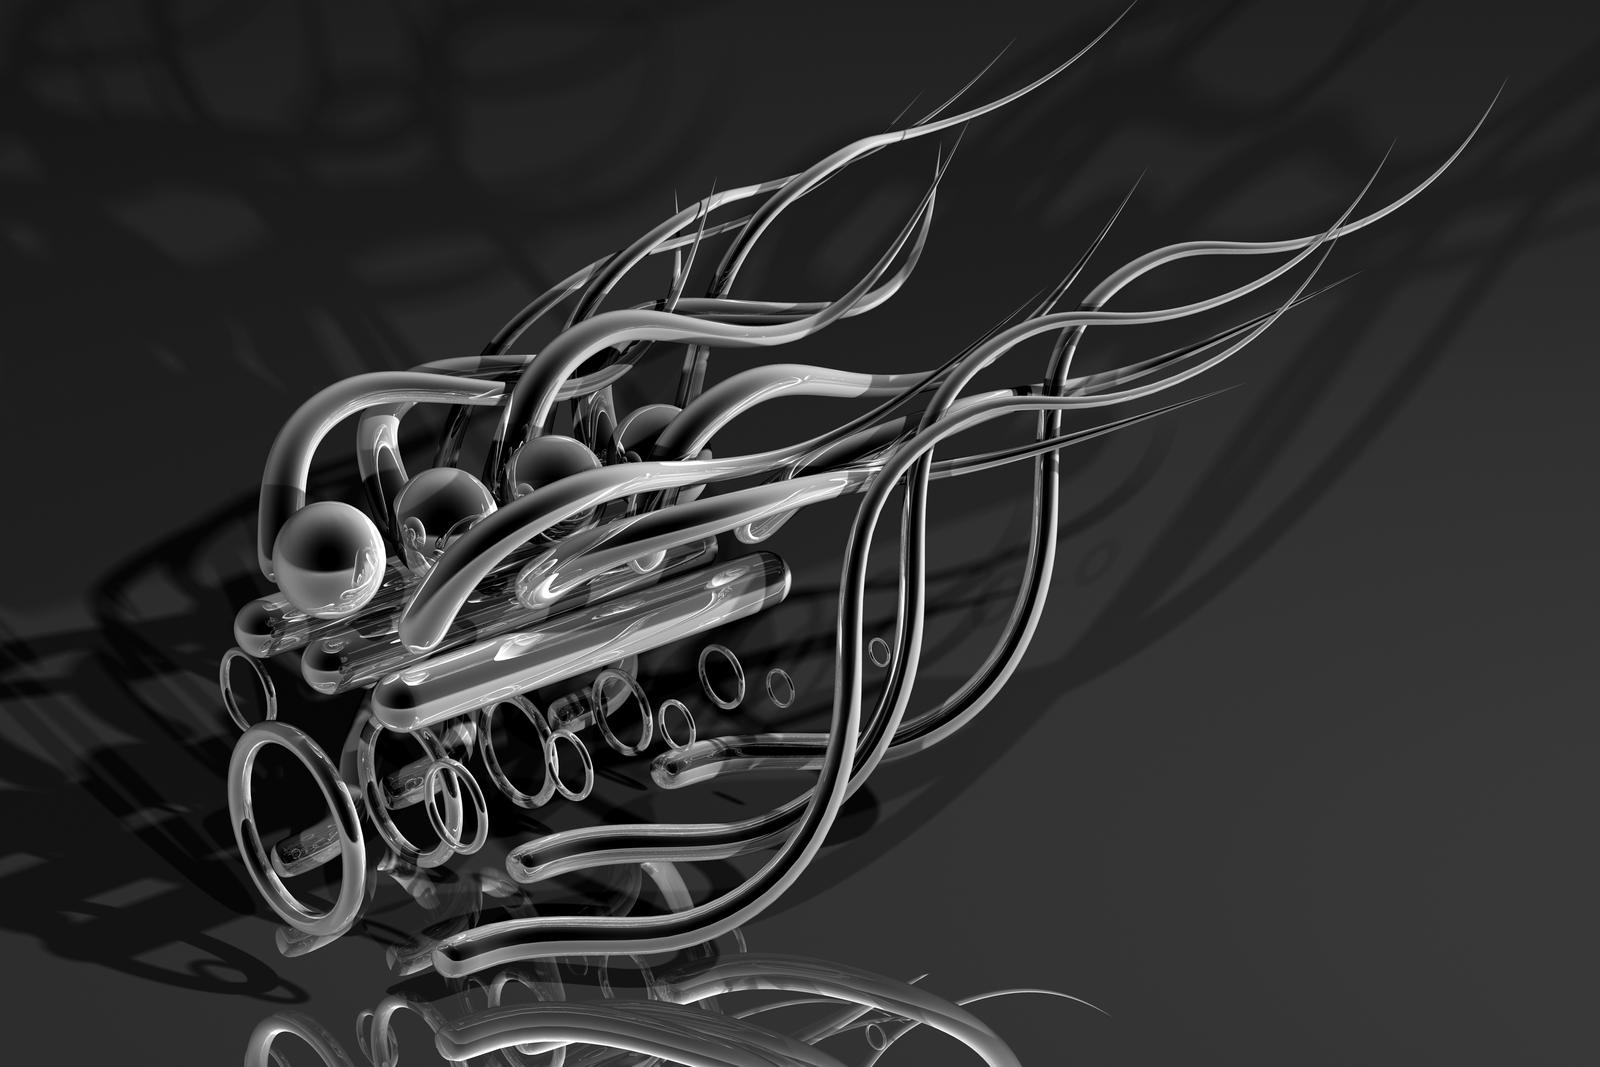 The Go-Kart Motor by TylerXy